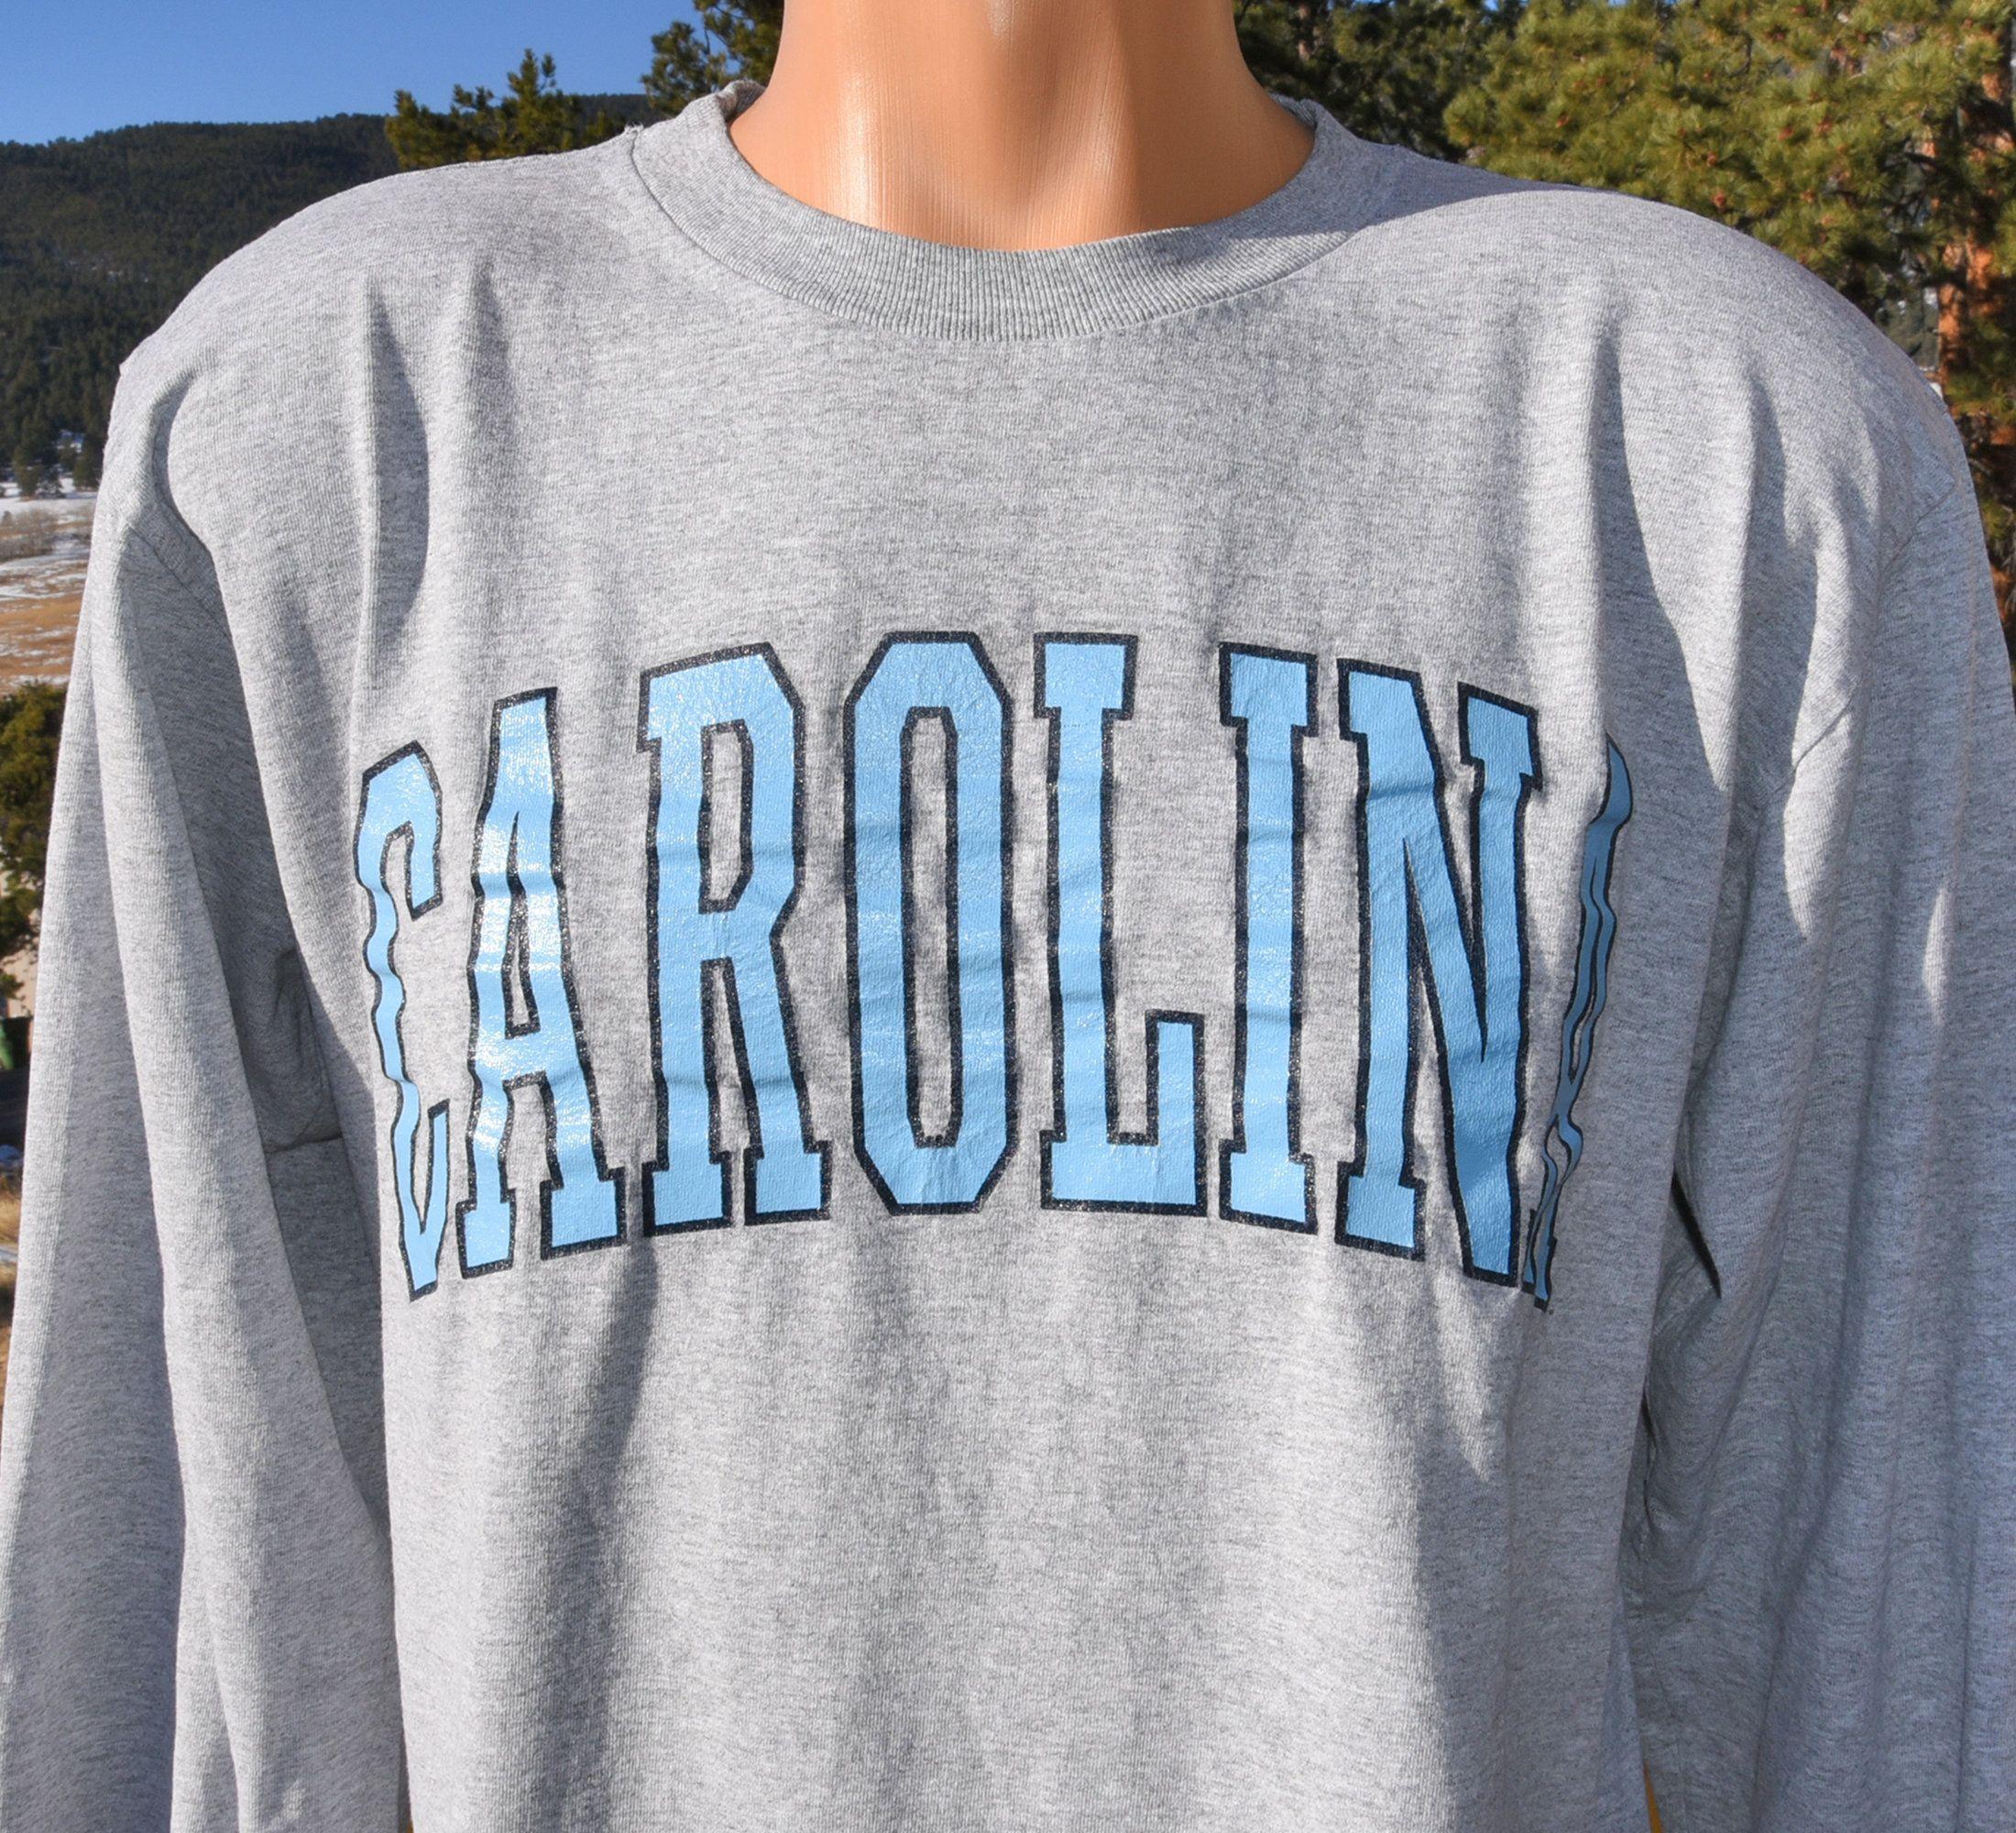 Vintage 90s Tee Unc University North Carolina Tar Heels Long Sleeve T Shirt Large Medium Unc Sweatshirt 90s Tees Shirts [ 2000 x 2200 Pixel ]